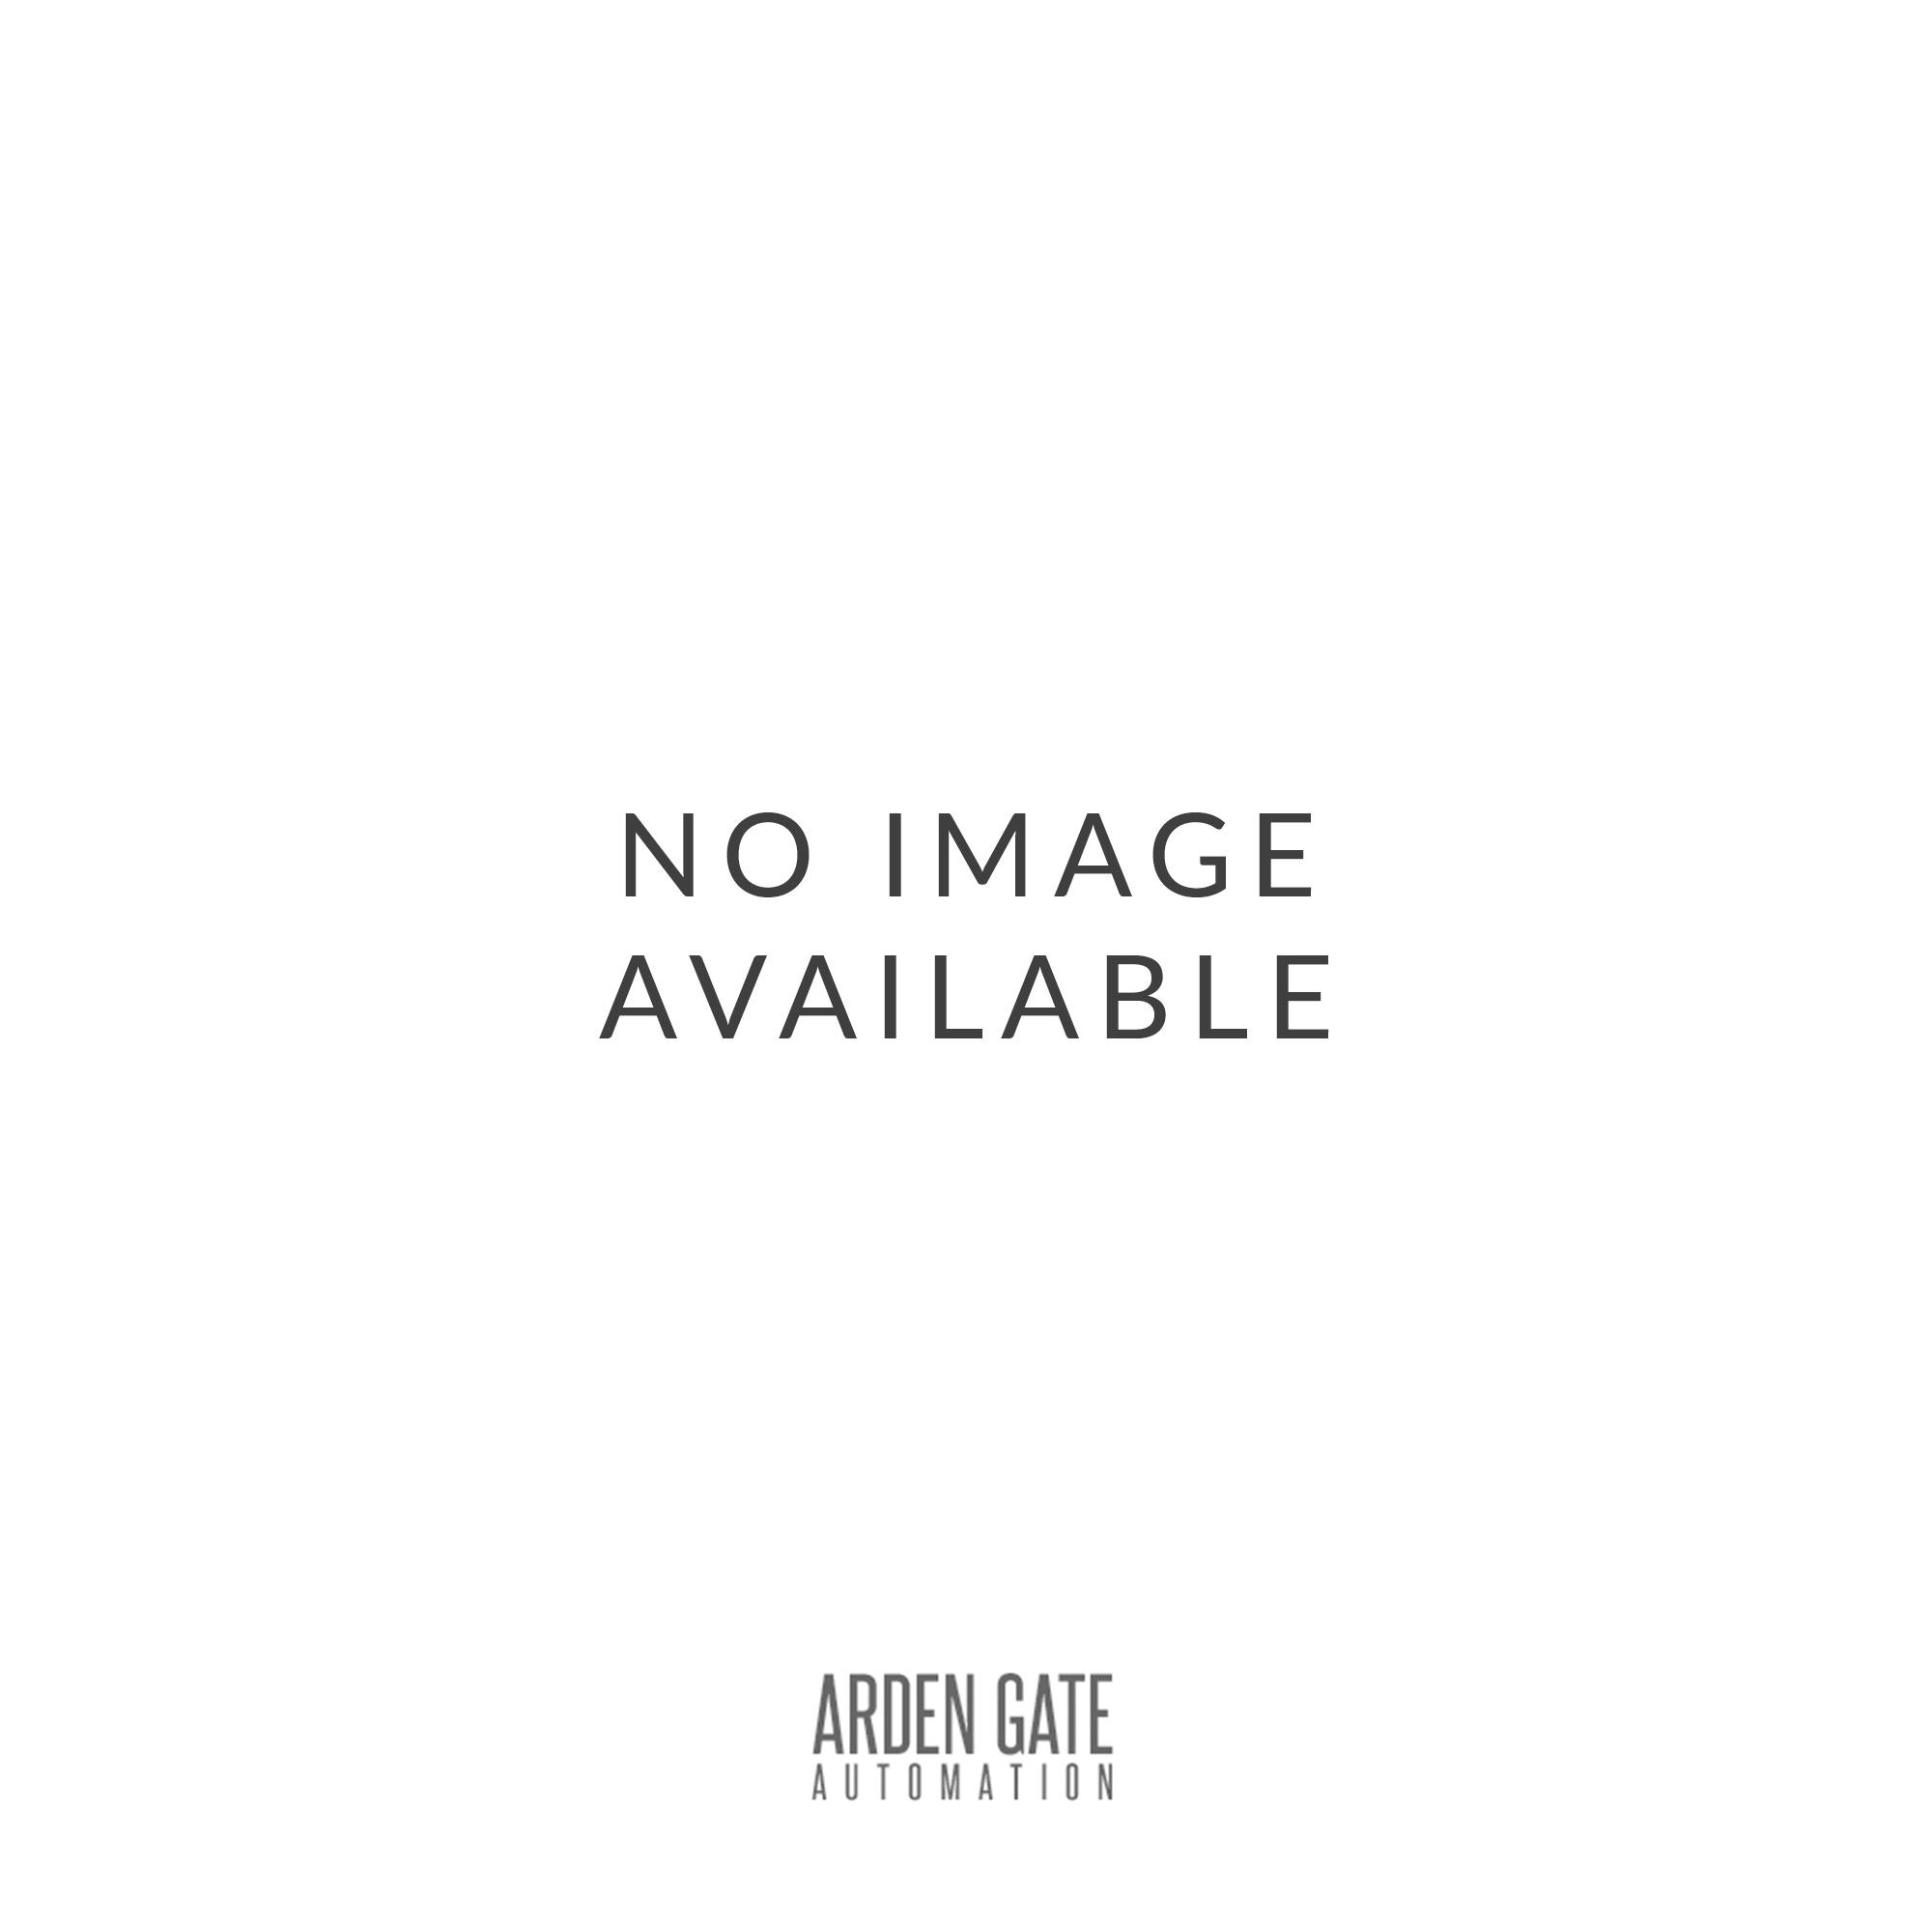 750 opening jack 100 degree Underground hydraulic operator motor only